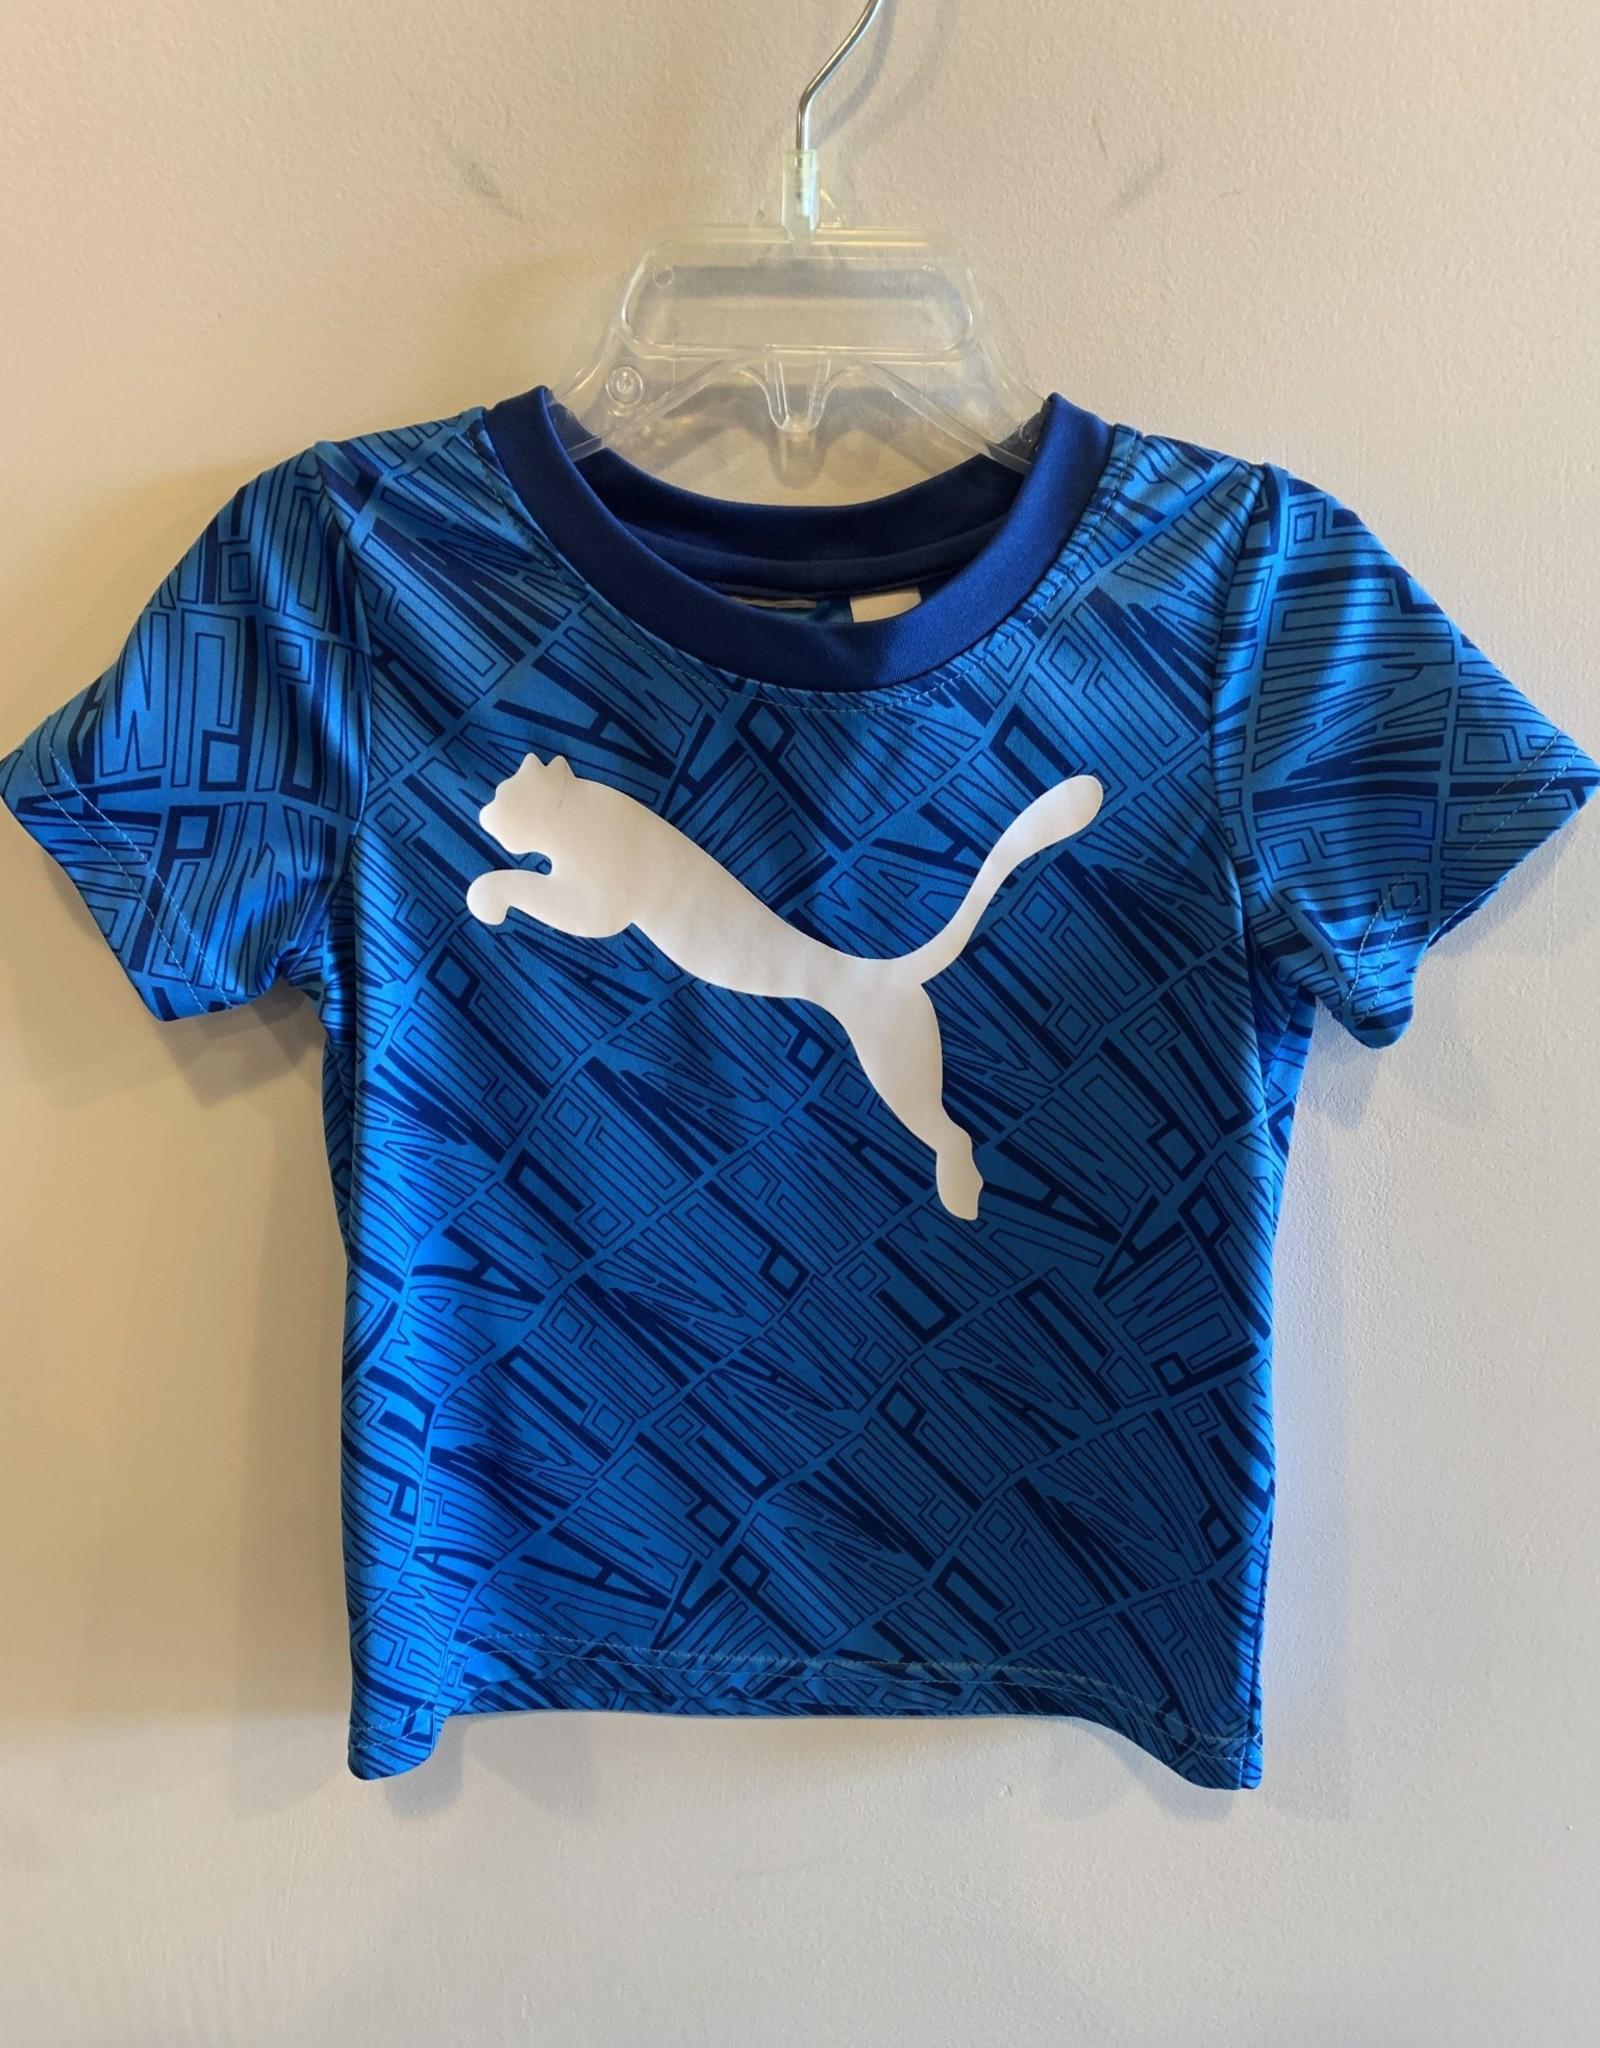 Puma Boys/2T/Puma/Shirt